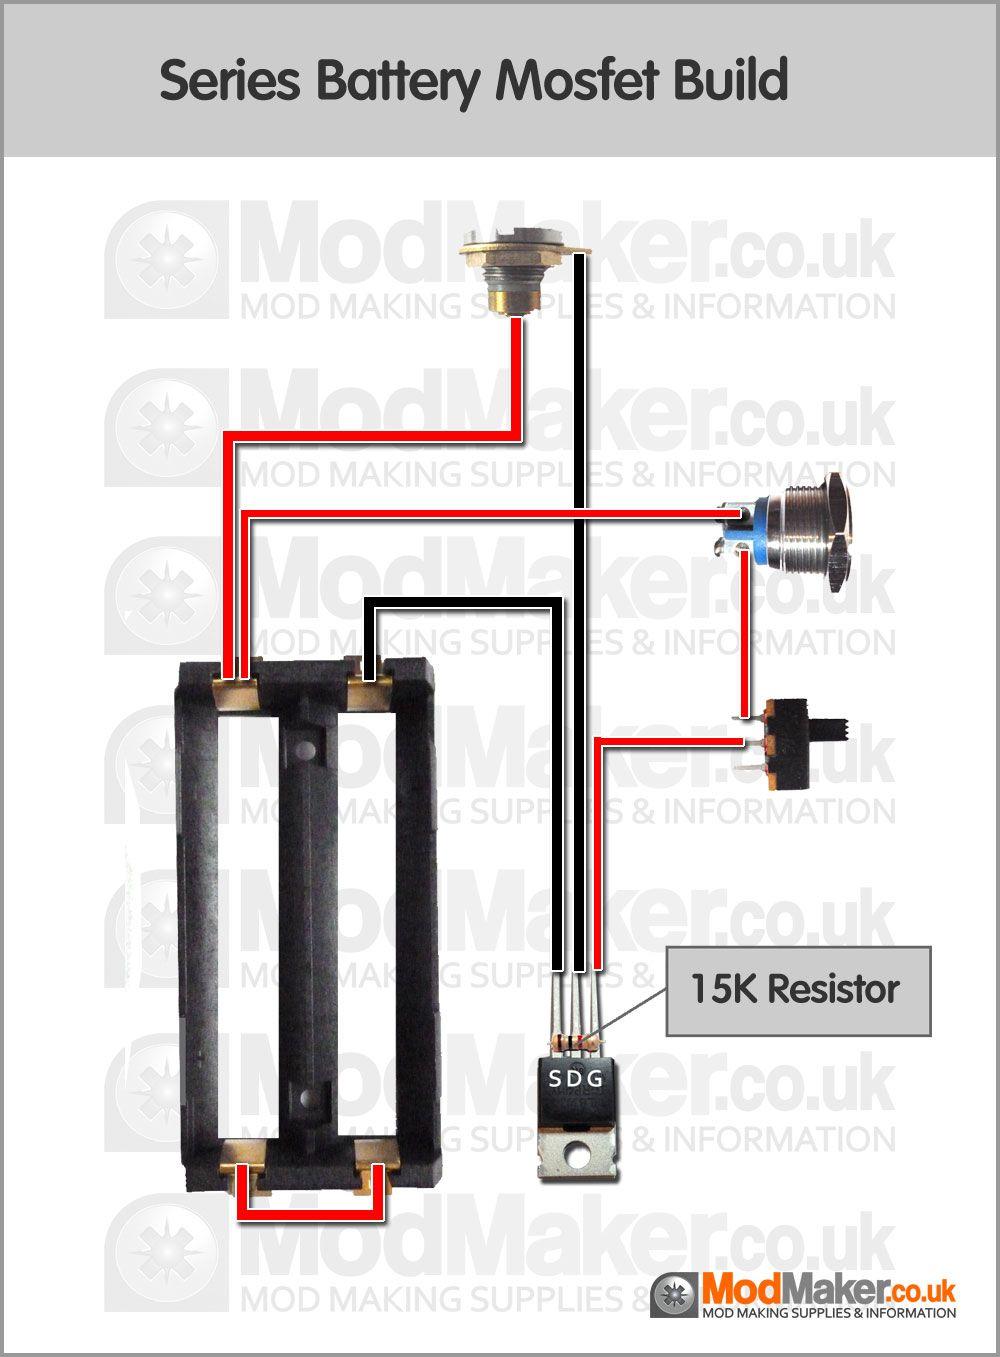 Series Battery Mosfet Wiring Diagram | box mods in 2019 | Vape mods diy, Vape diy, Diy box mod